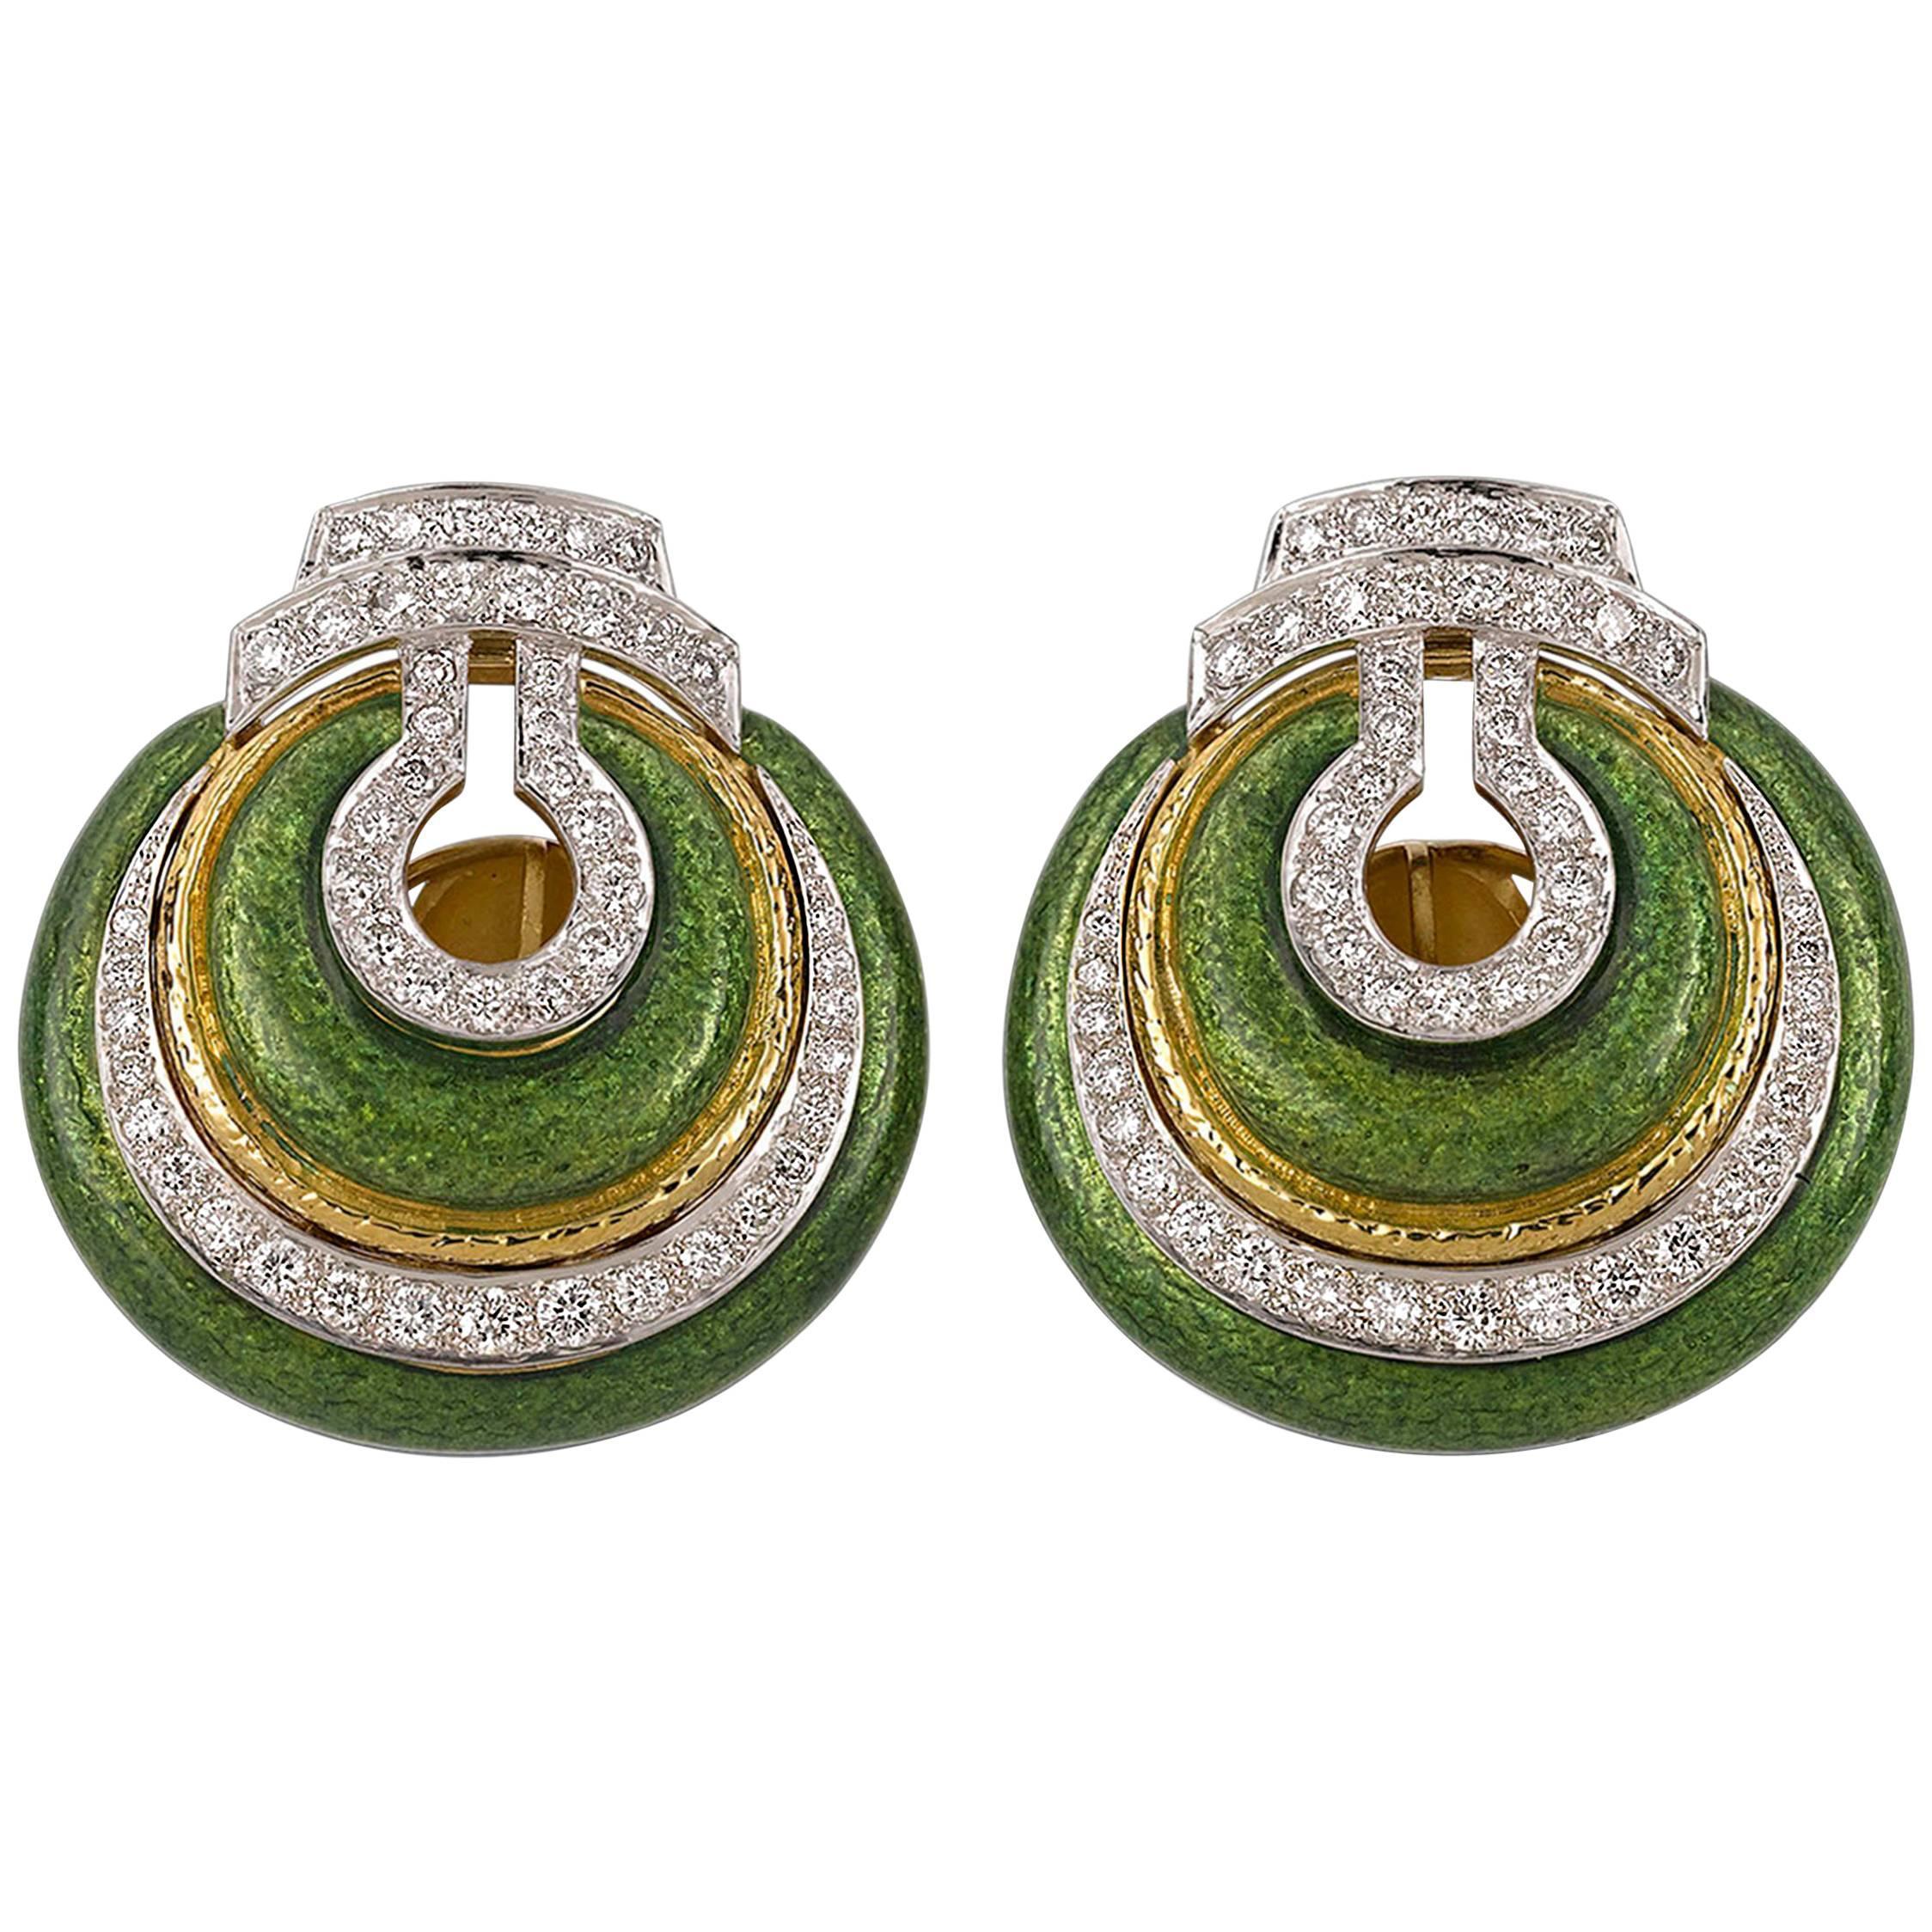 David Webb Enamel and Diamond Earrings